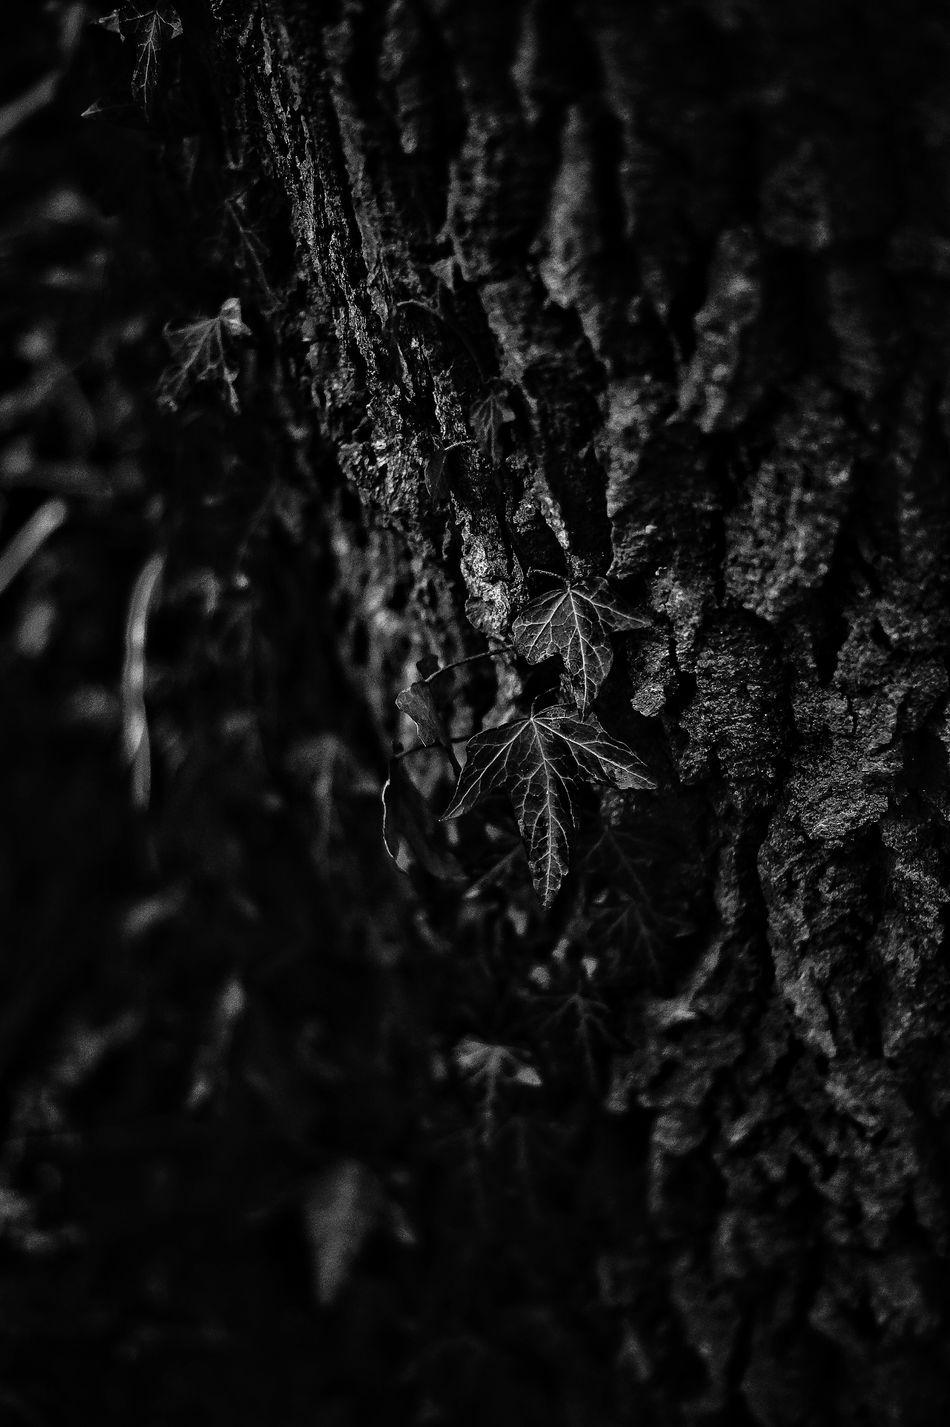 Sonya58 First Eyeem Photo Bokeh Forest Blackandwhite Photography Blackandwhite Trees Mysthical Sony A58 Alpha58 Shady